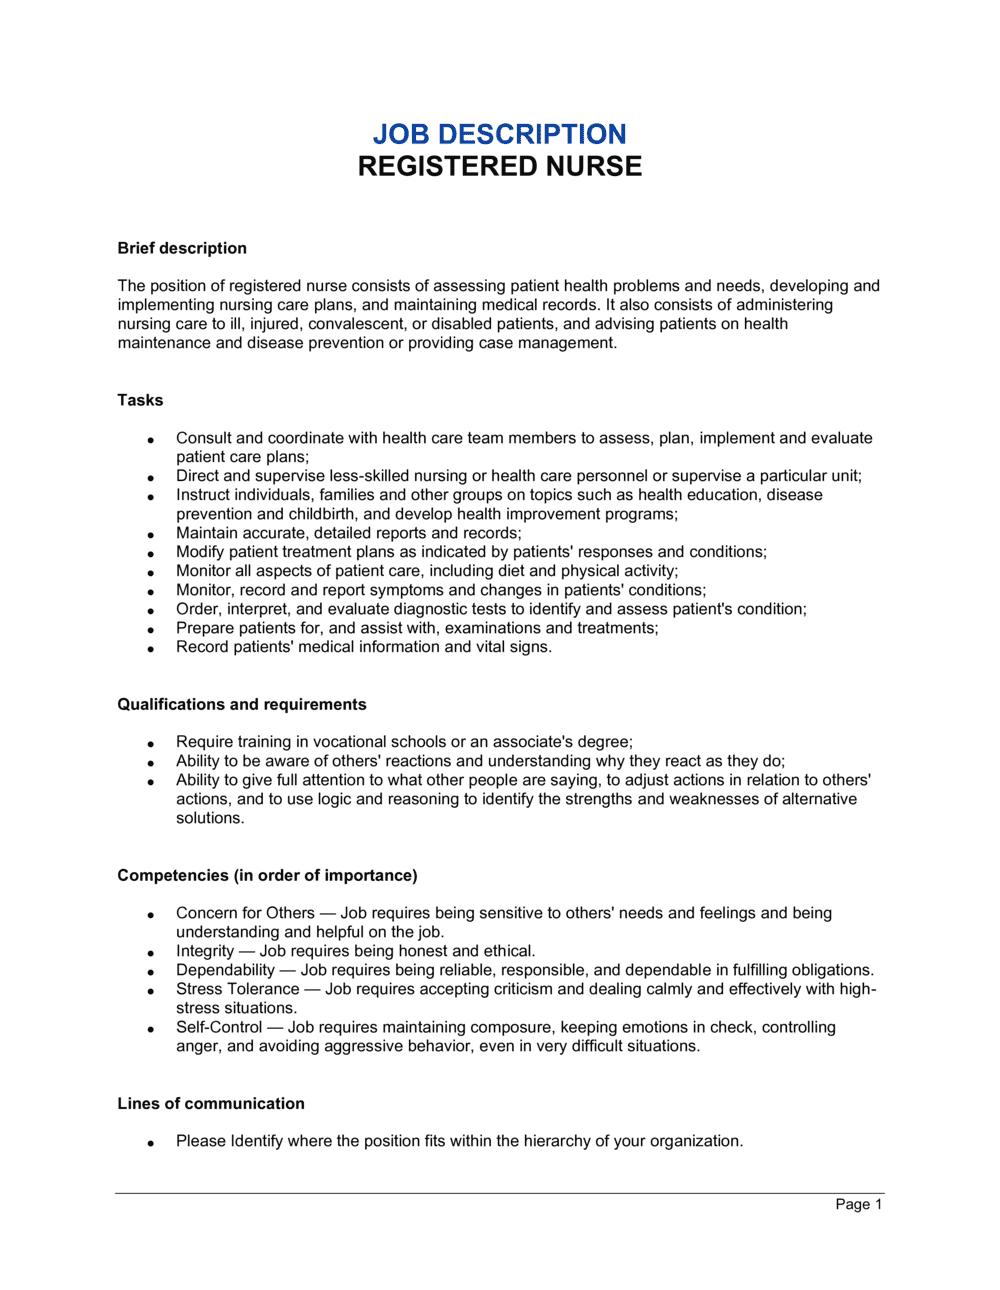 Business-in-a-Box's Registered Nurse Job Description Template